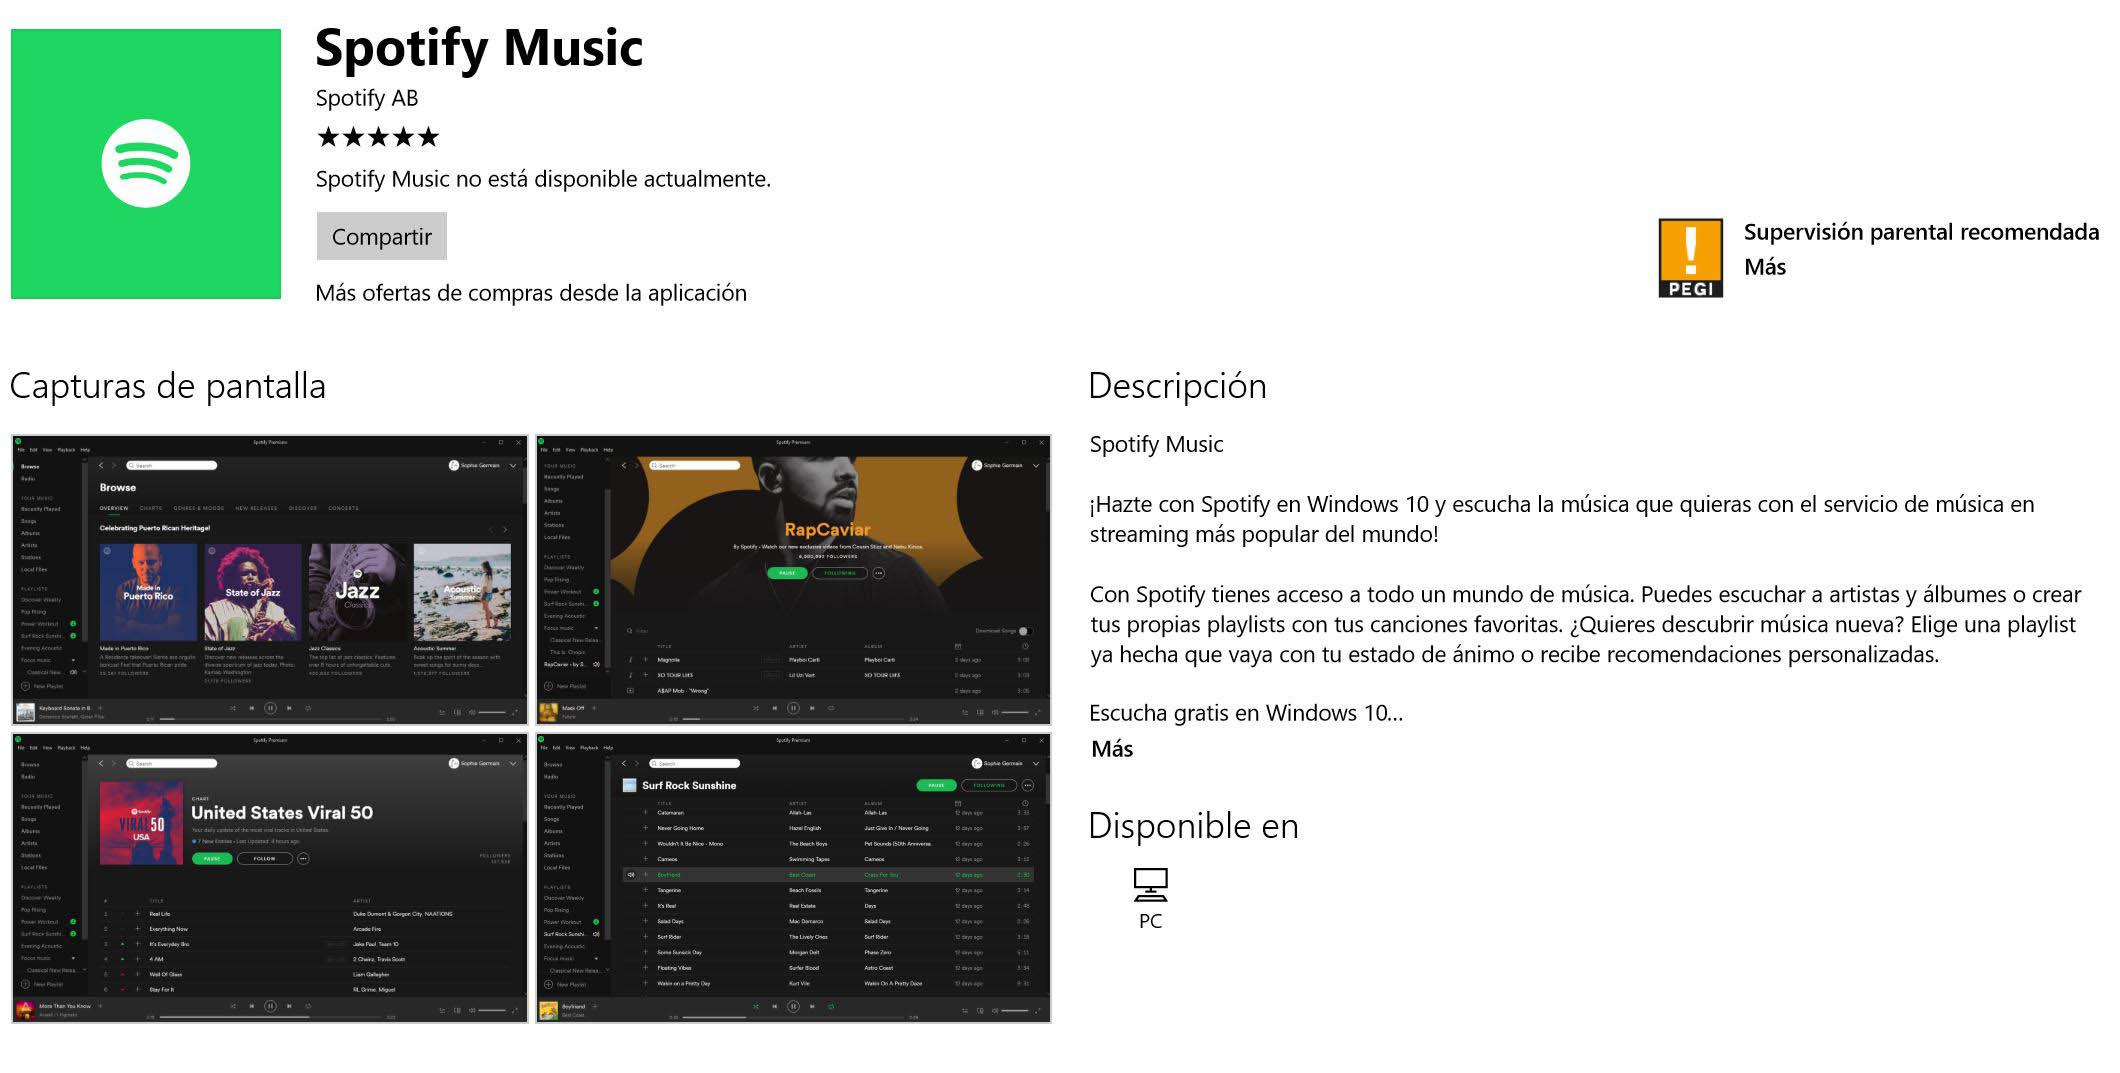 Captura_Tienda_Spotify